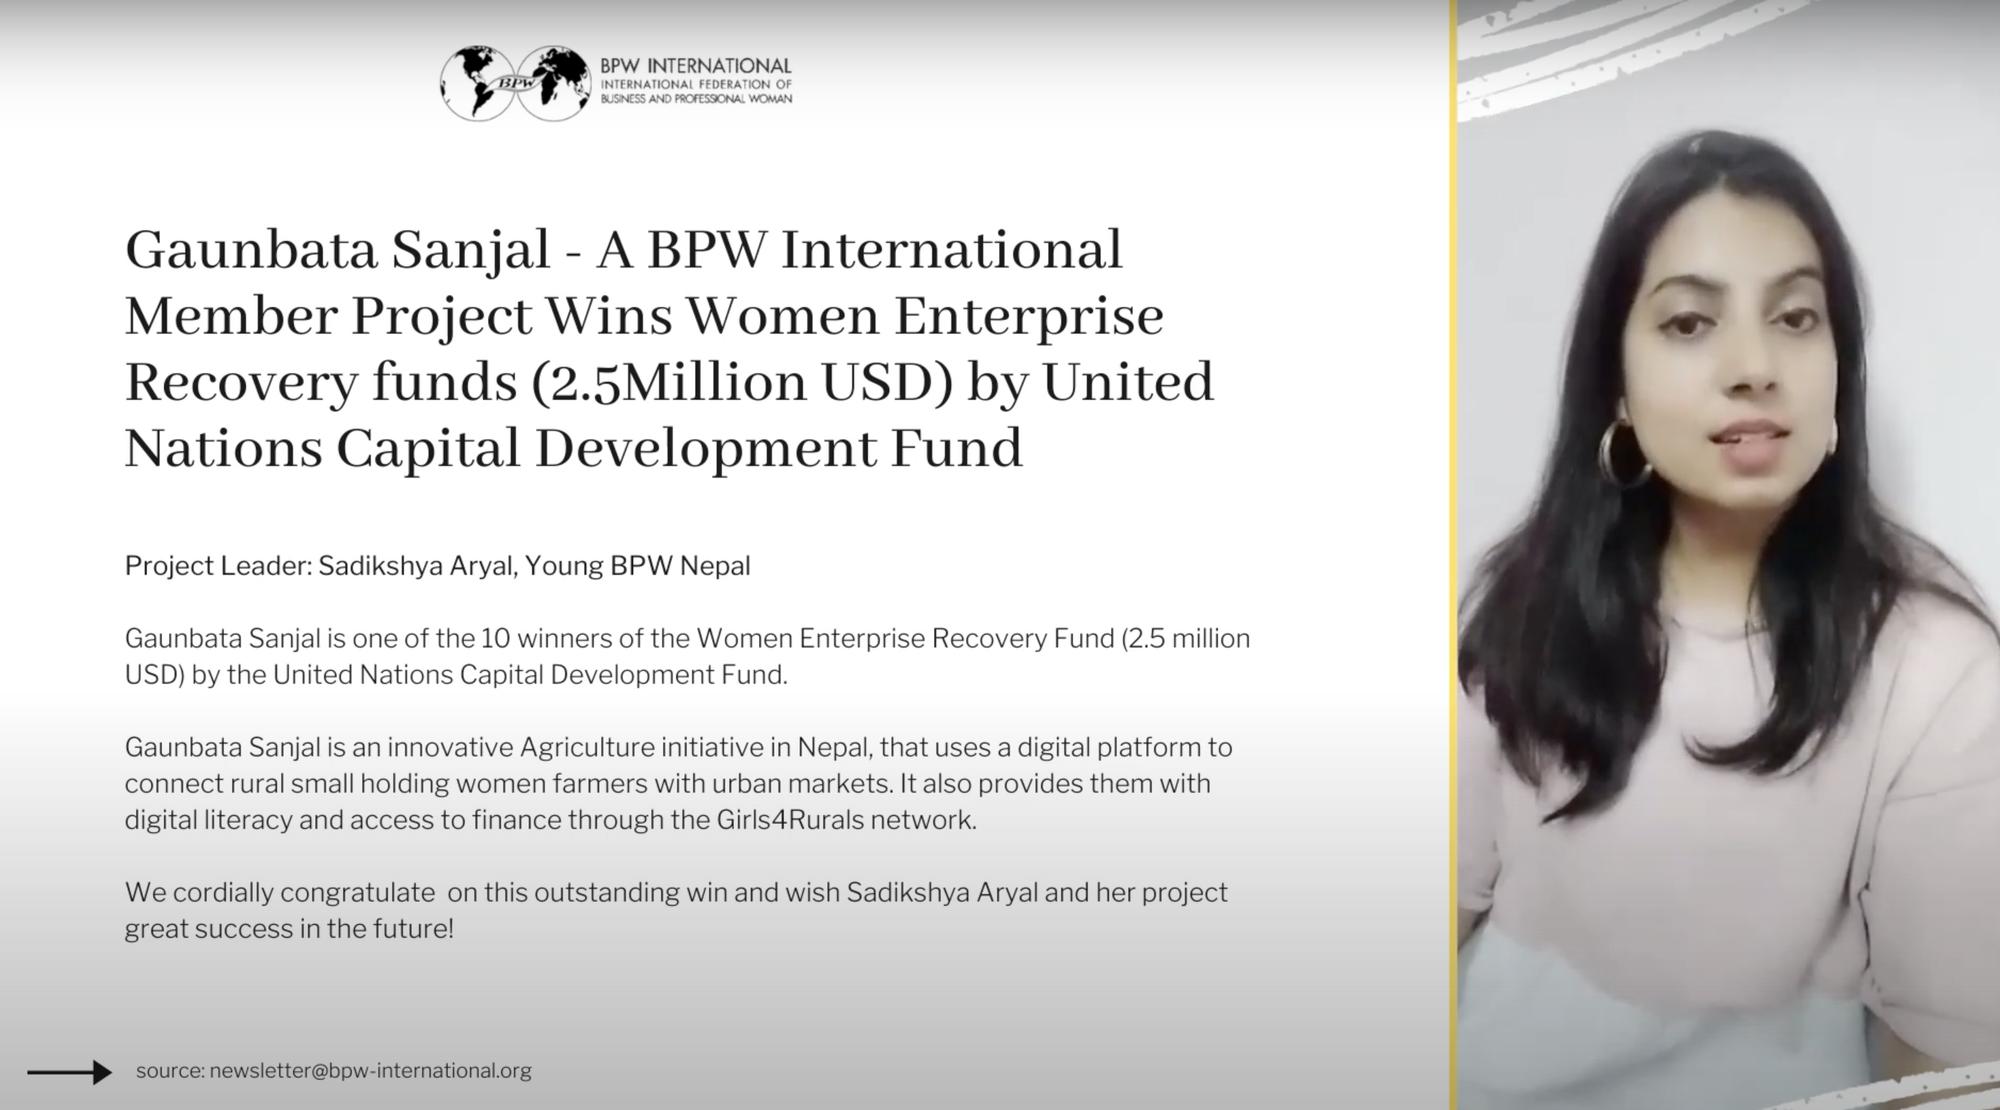 Sadikshya Aryal, Young BPW Nepal - Prize Winning Member Project